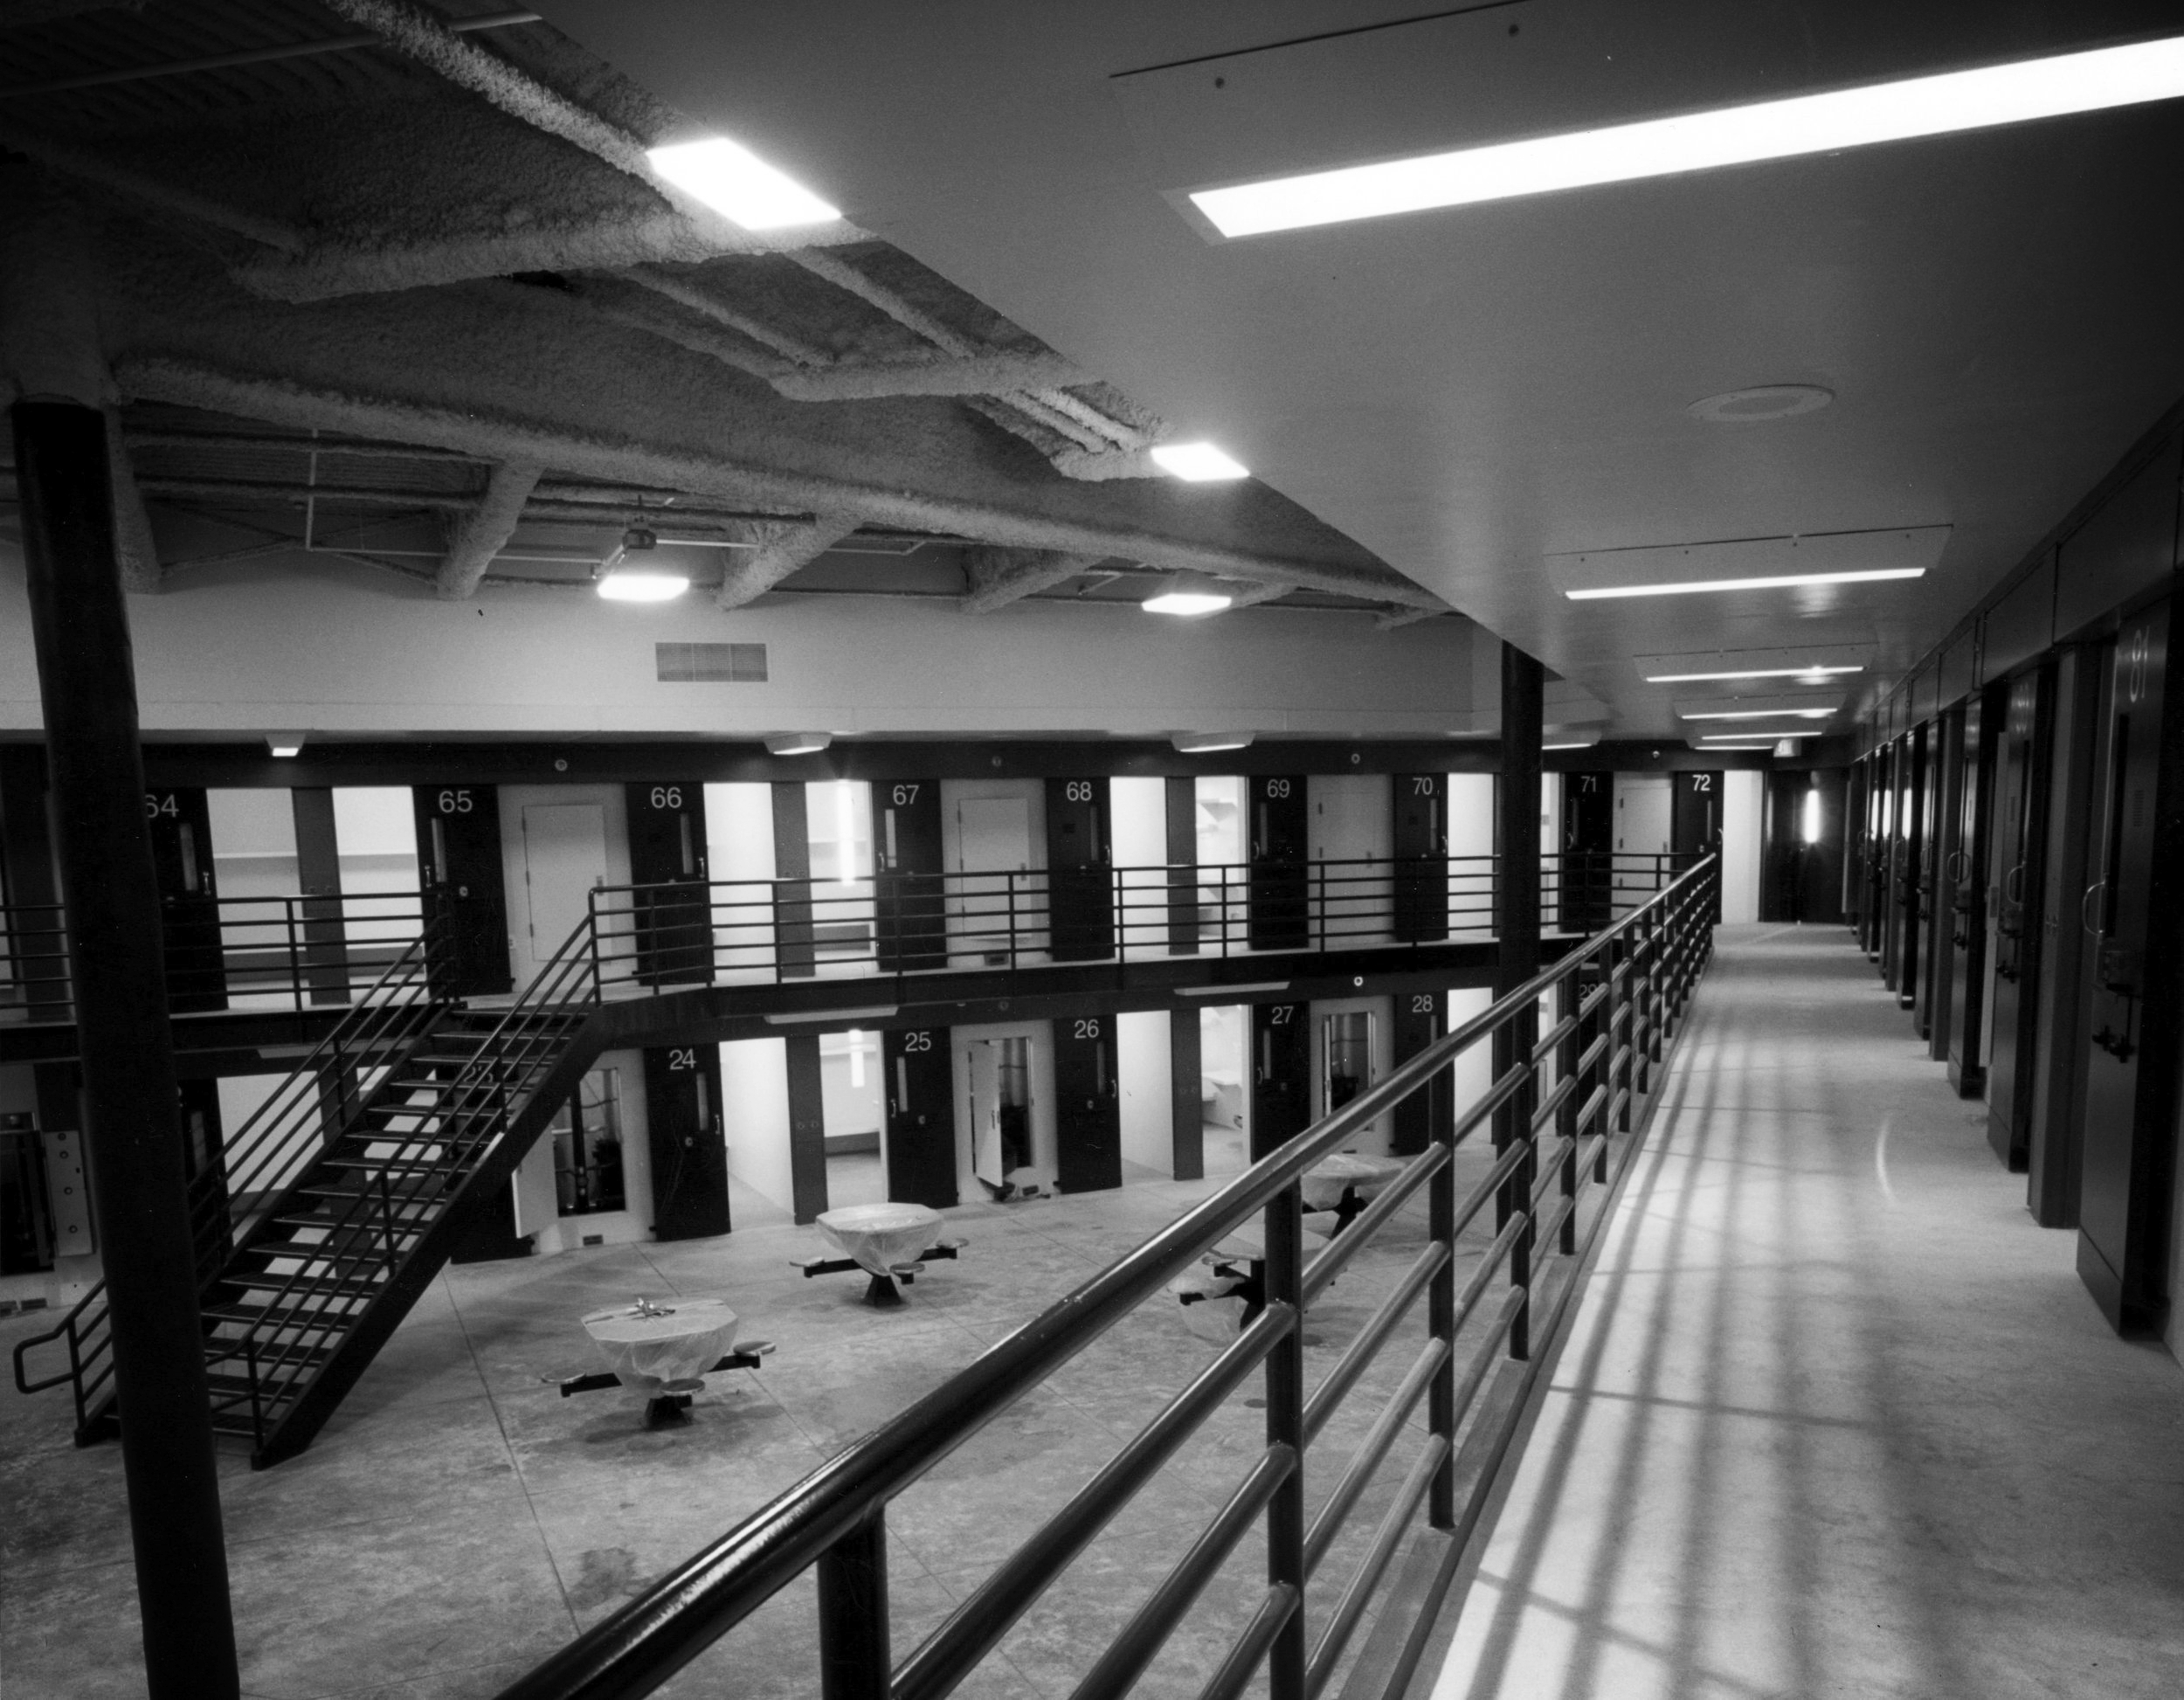 jail cells top level.jpg